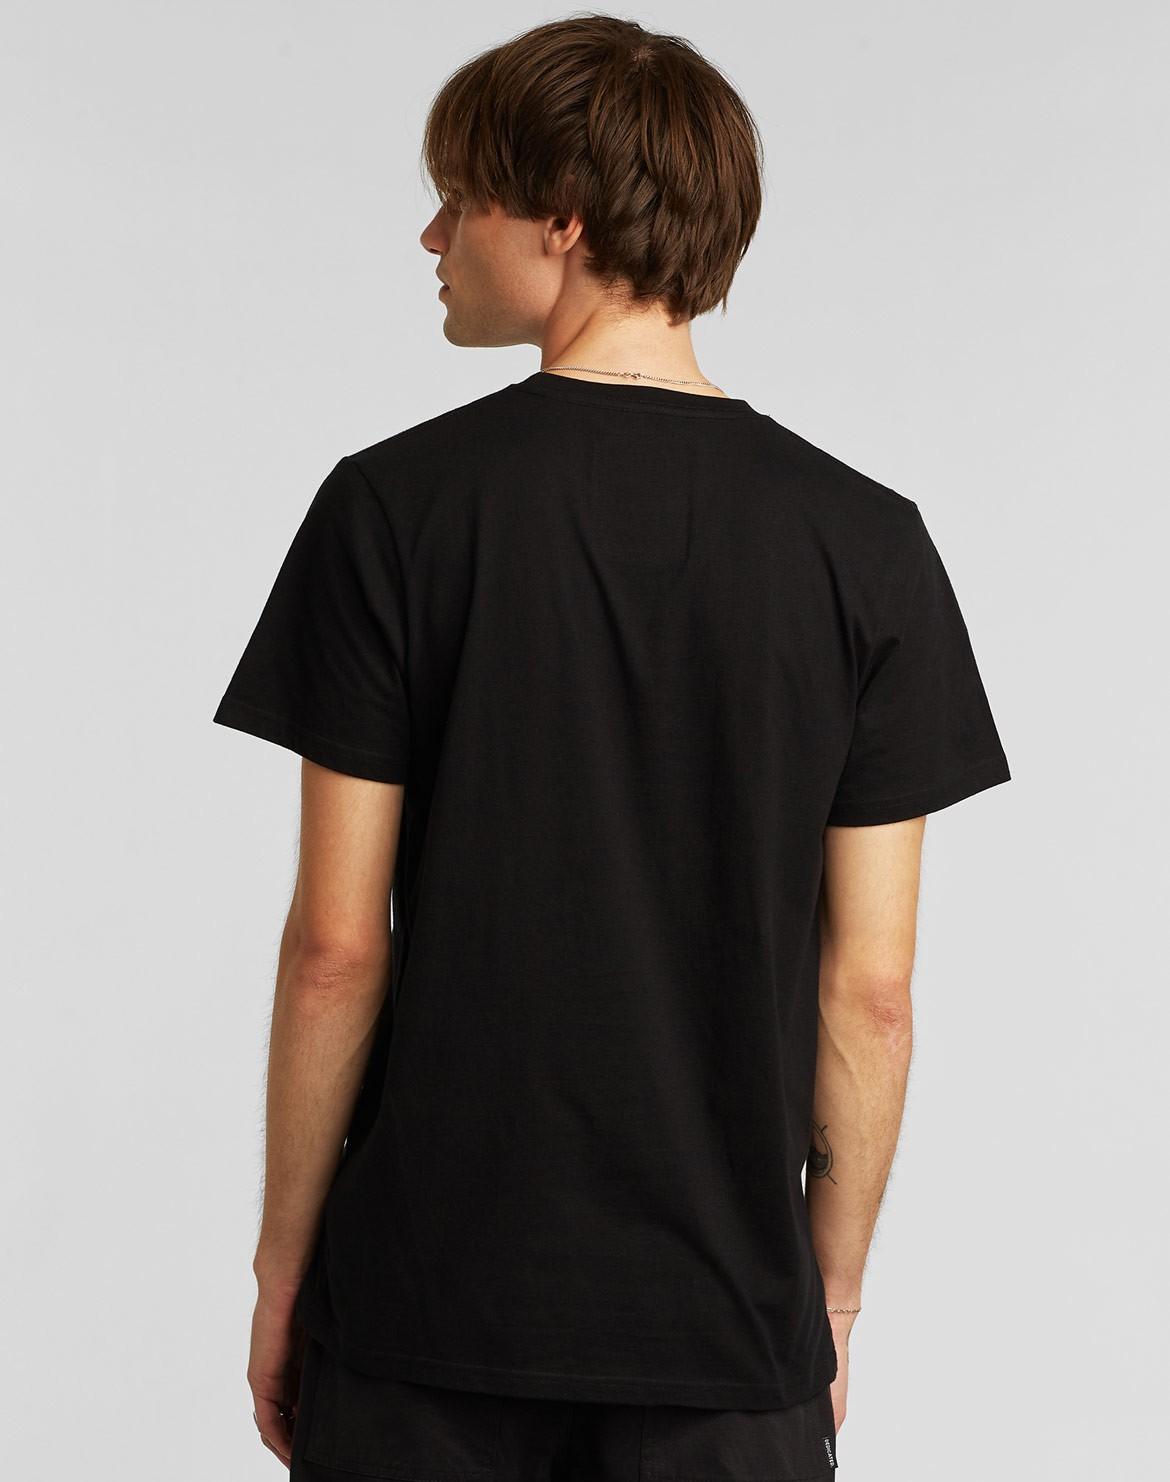 Stockholm T-Shirt Stitch Bike